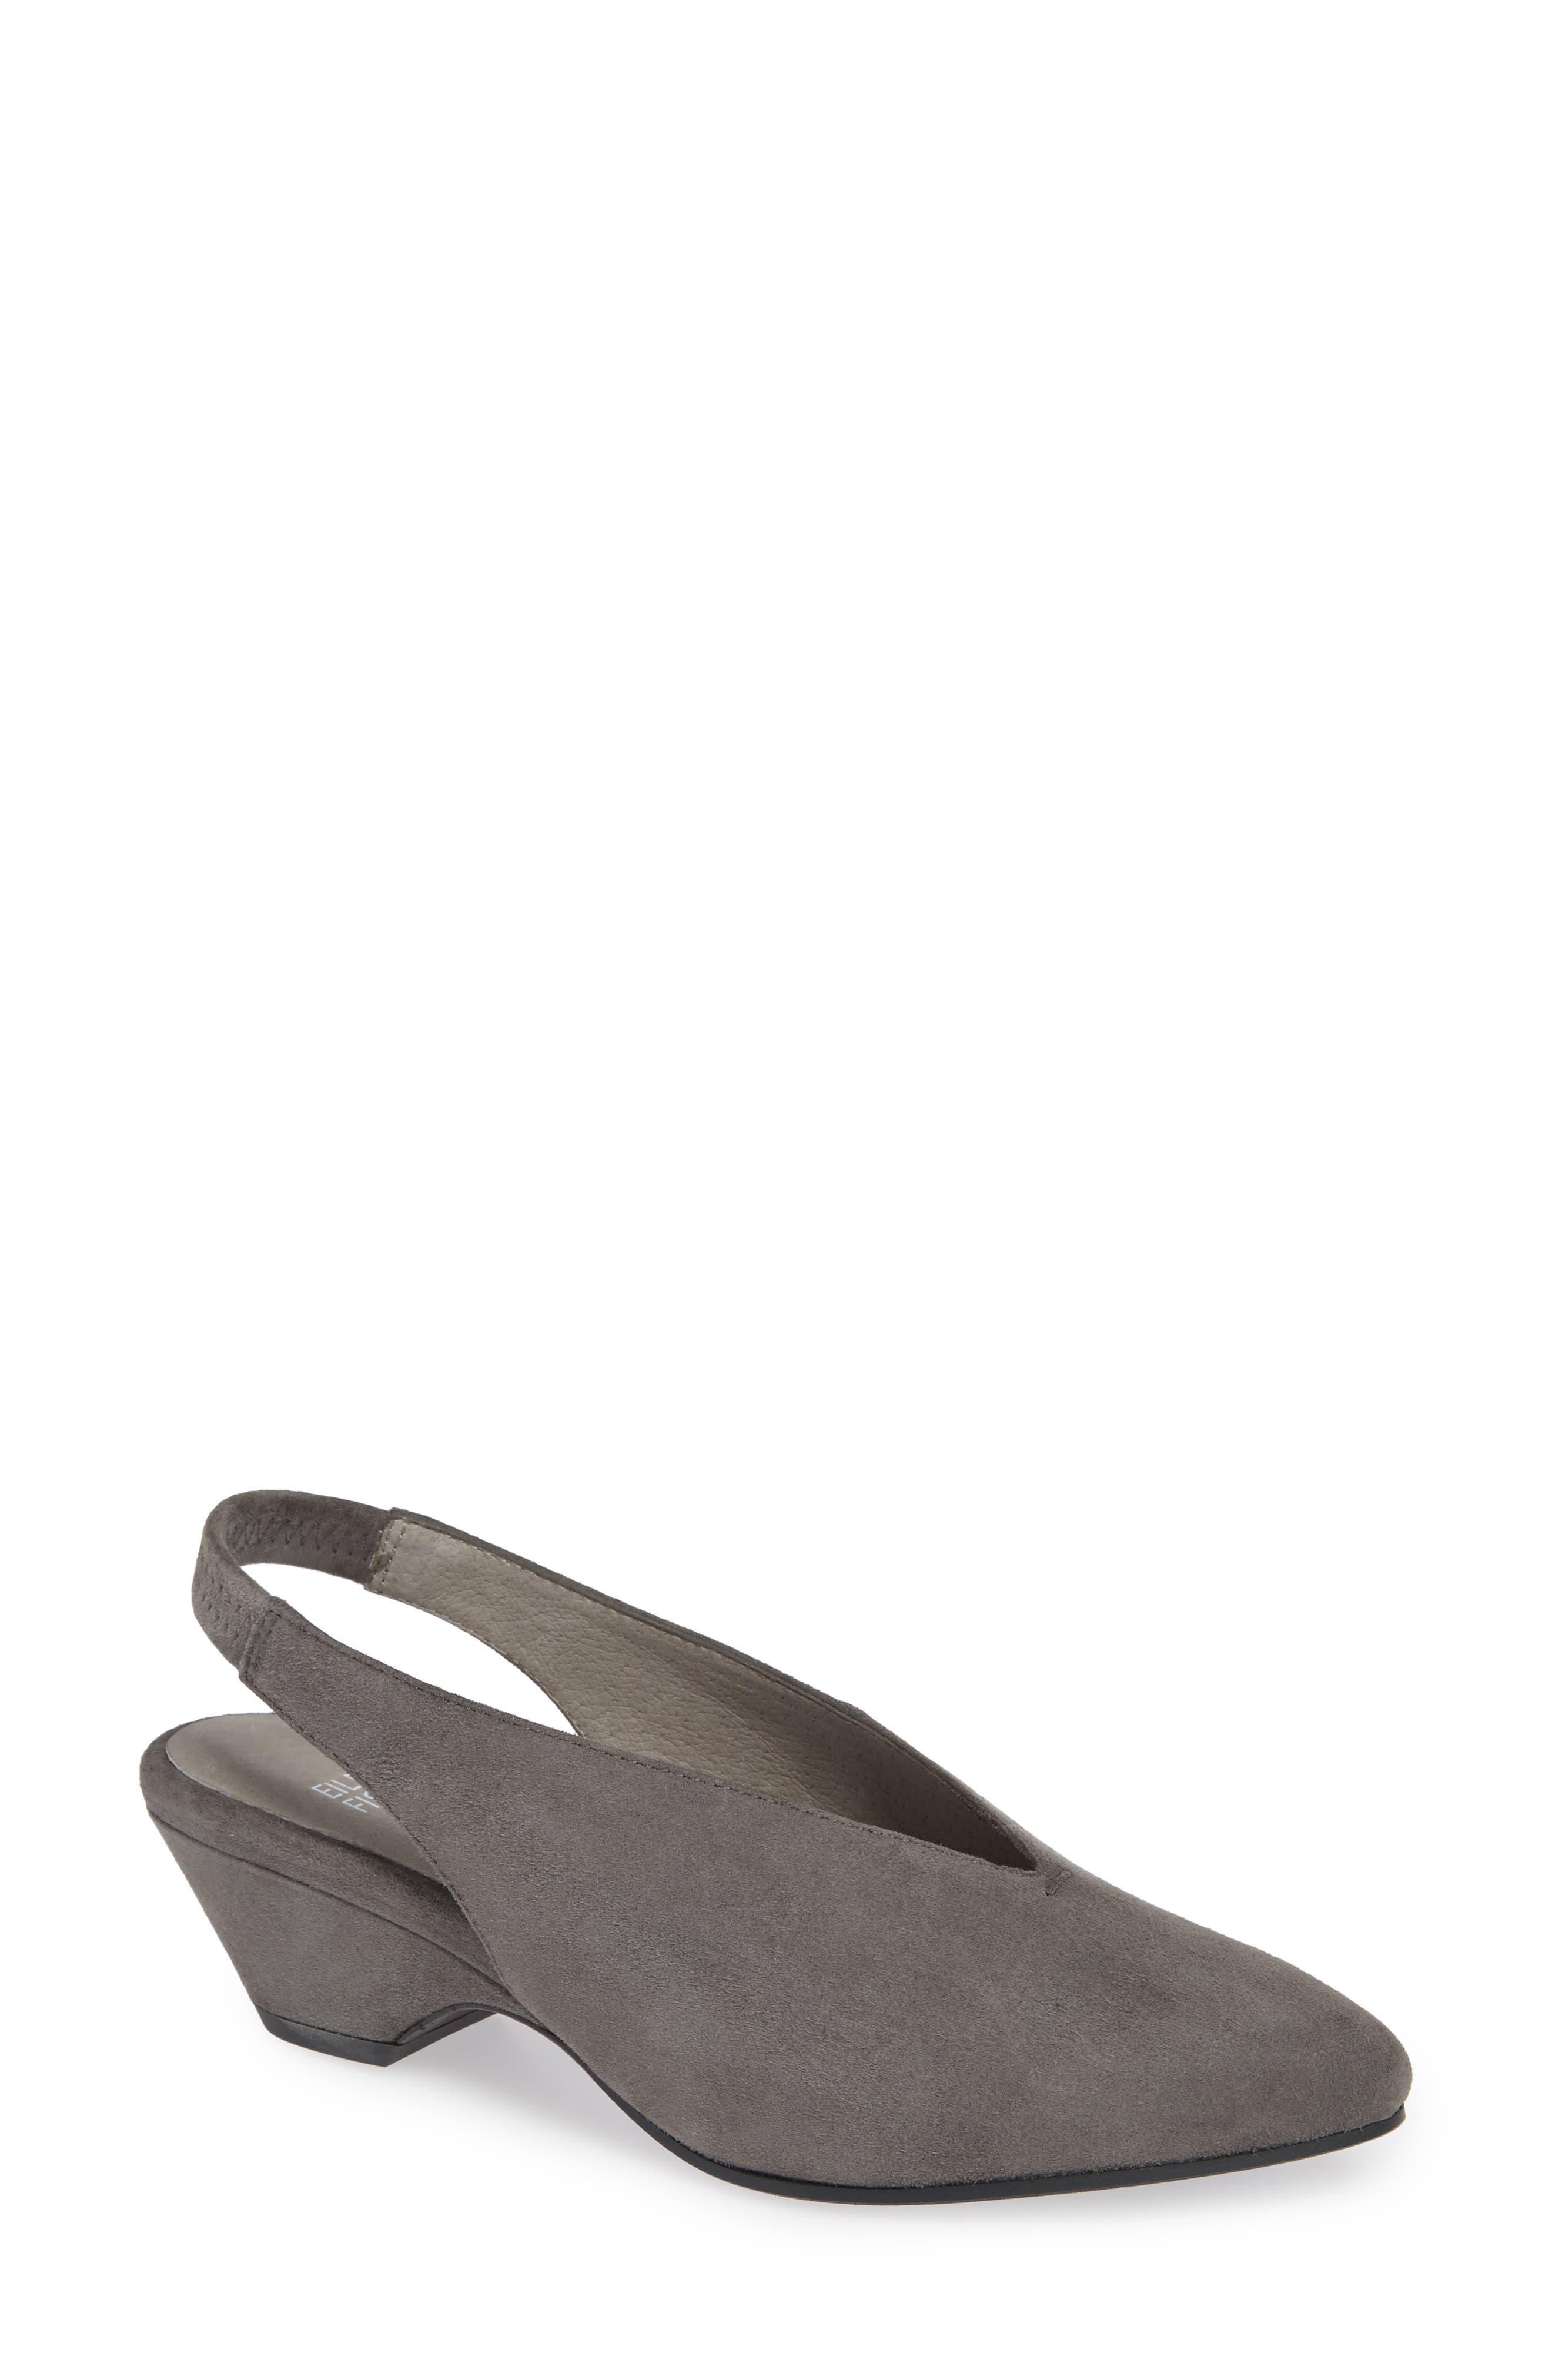 Eileen Fisher Gatwick Slingback Pump, Grey